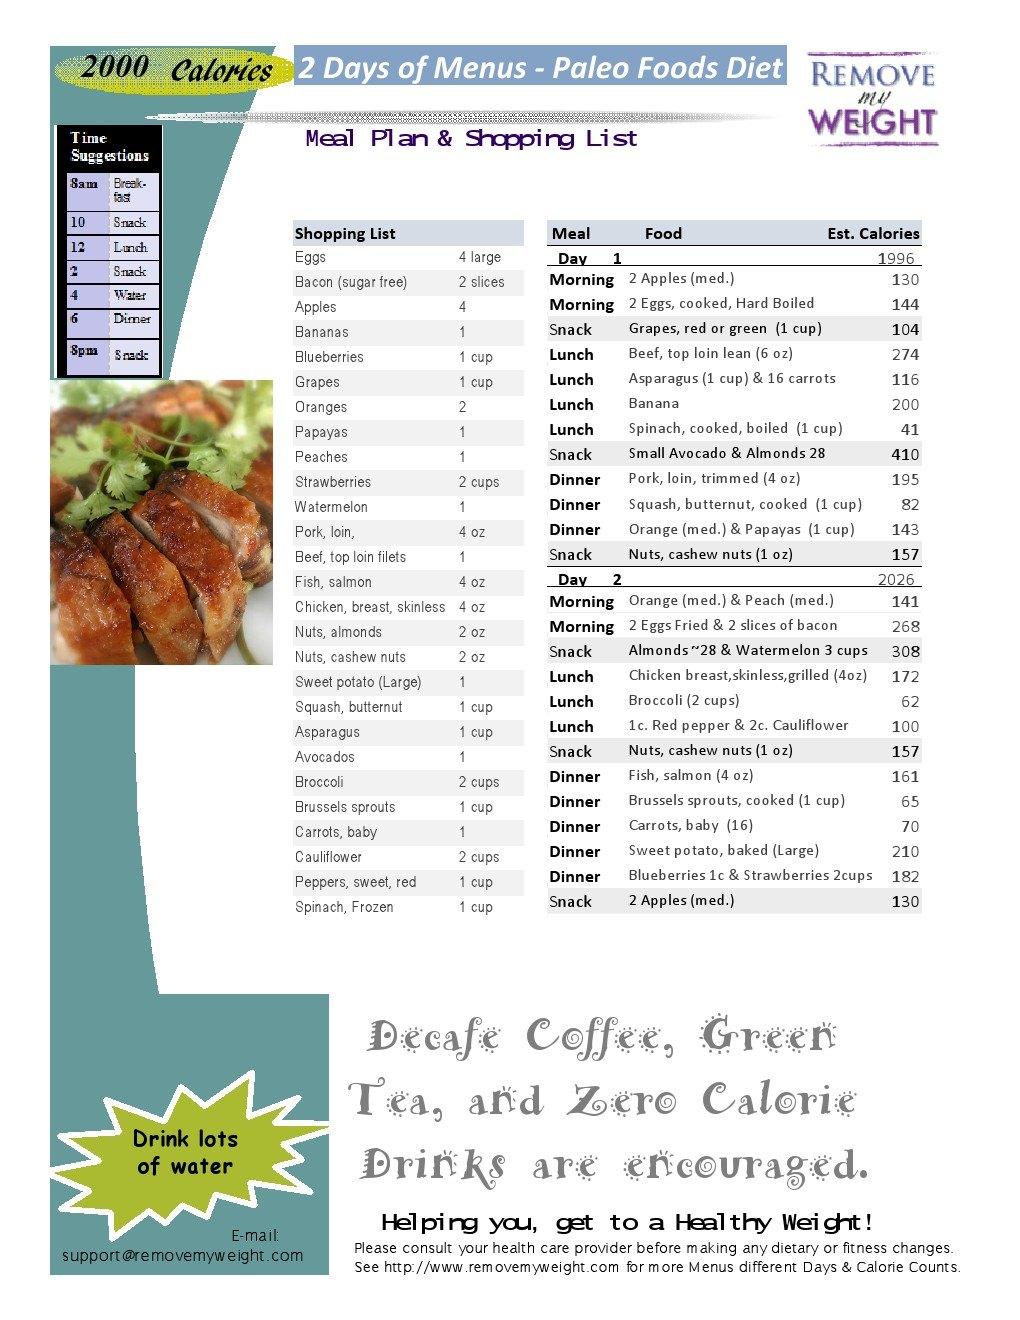 Paleo Diet 2 Day Menu Plan at 2000 Calories a day